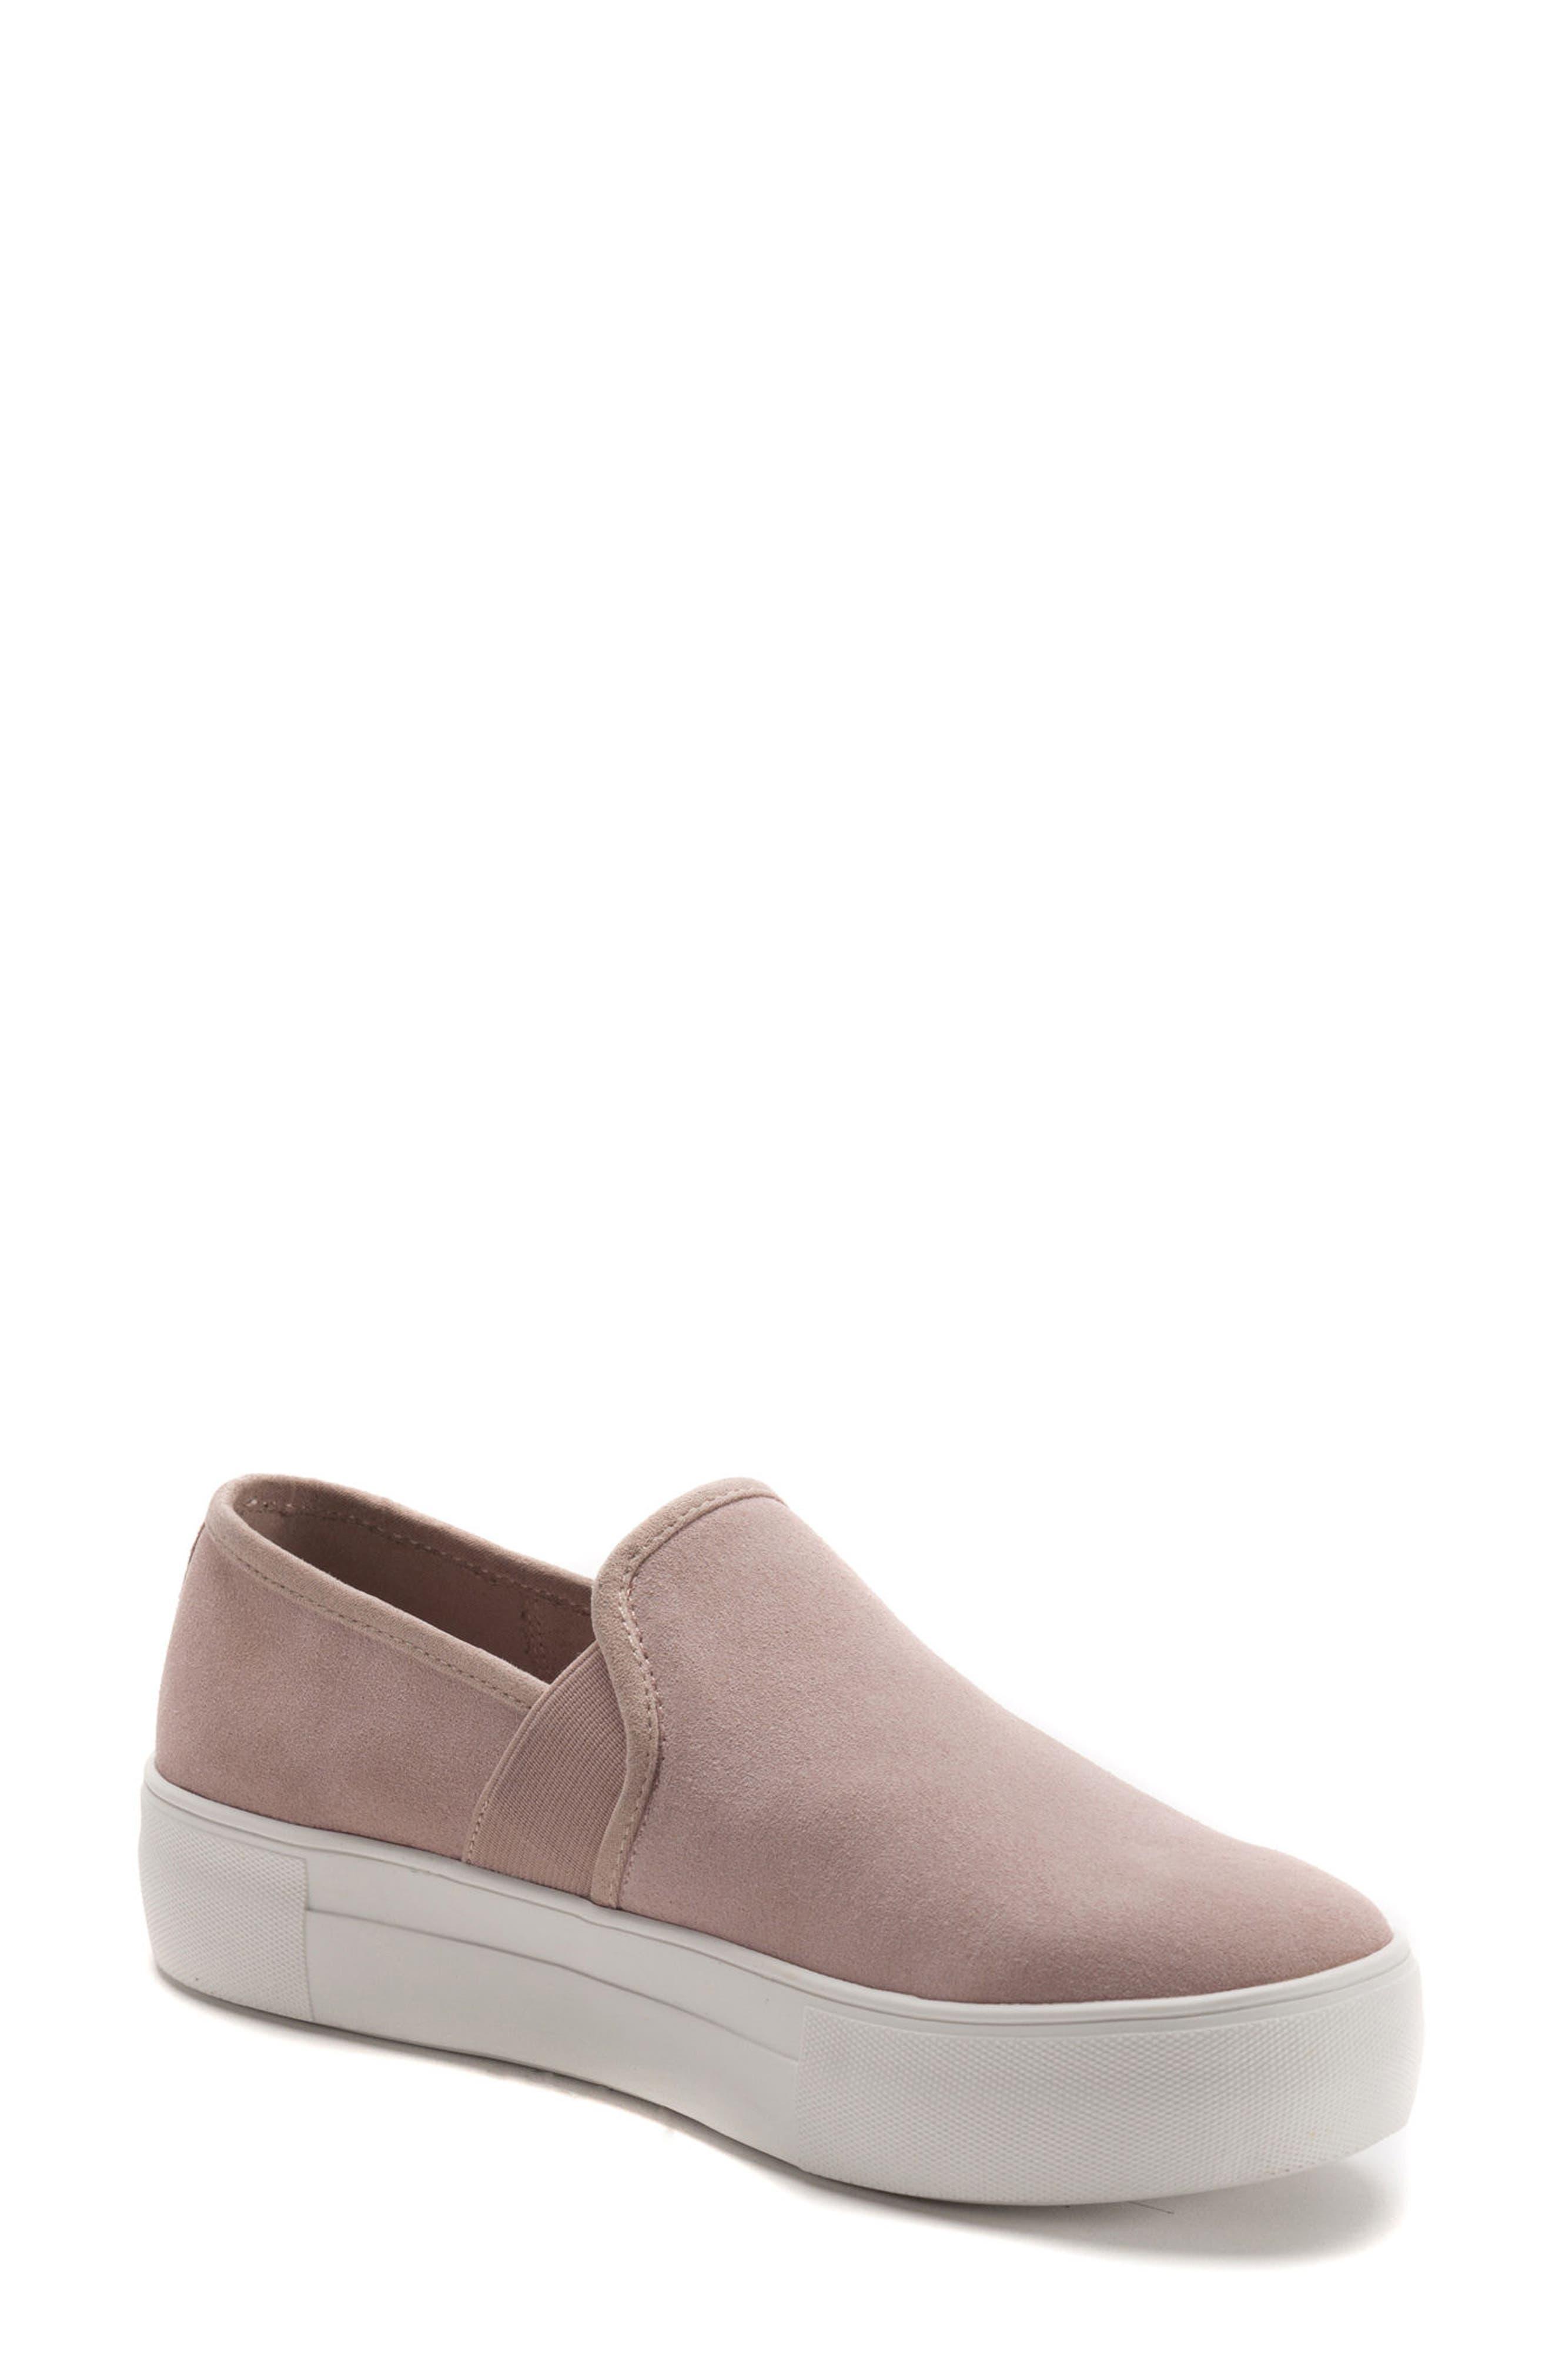 Blondo Glance Waterproof Sneaker- Pink